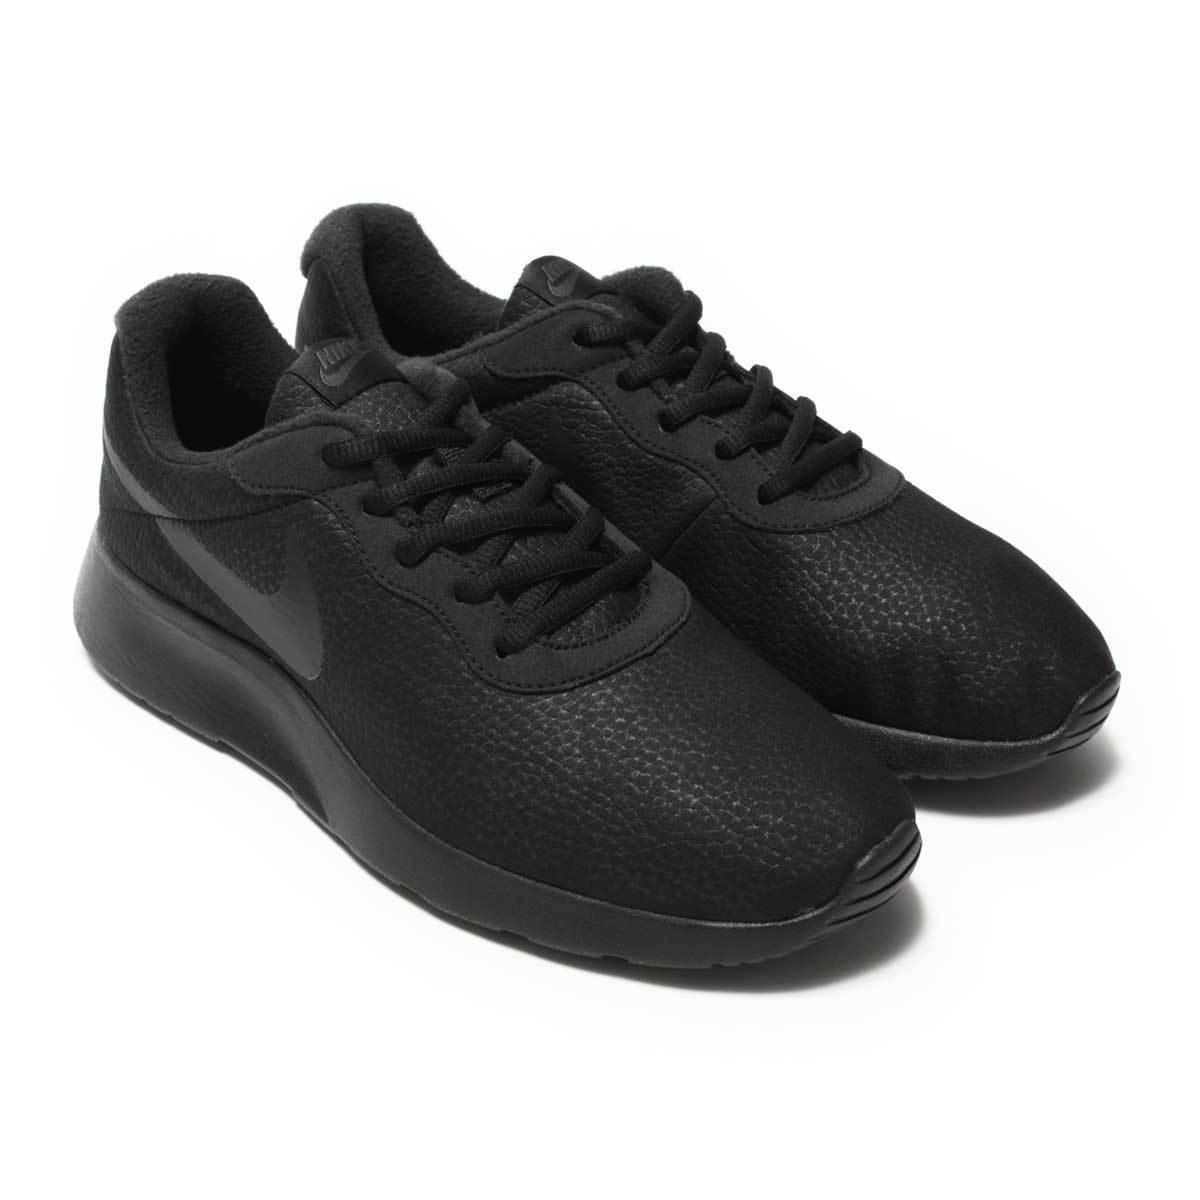 Men's Nike Tanjun Premium Black/Anthracite Sizes 8-12 New In Box 876899-005